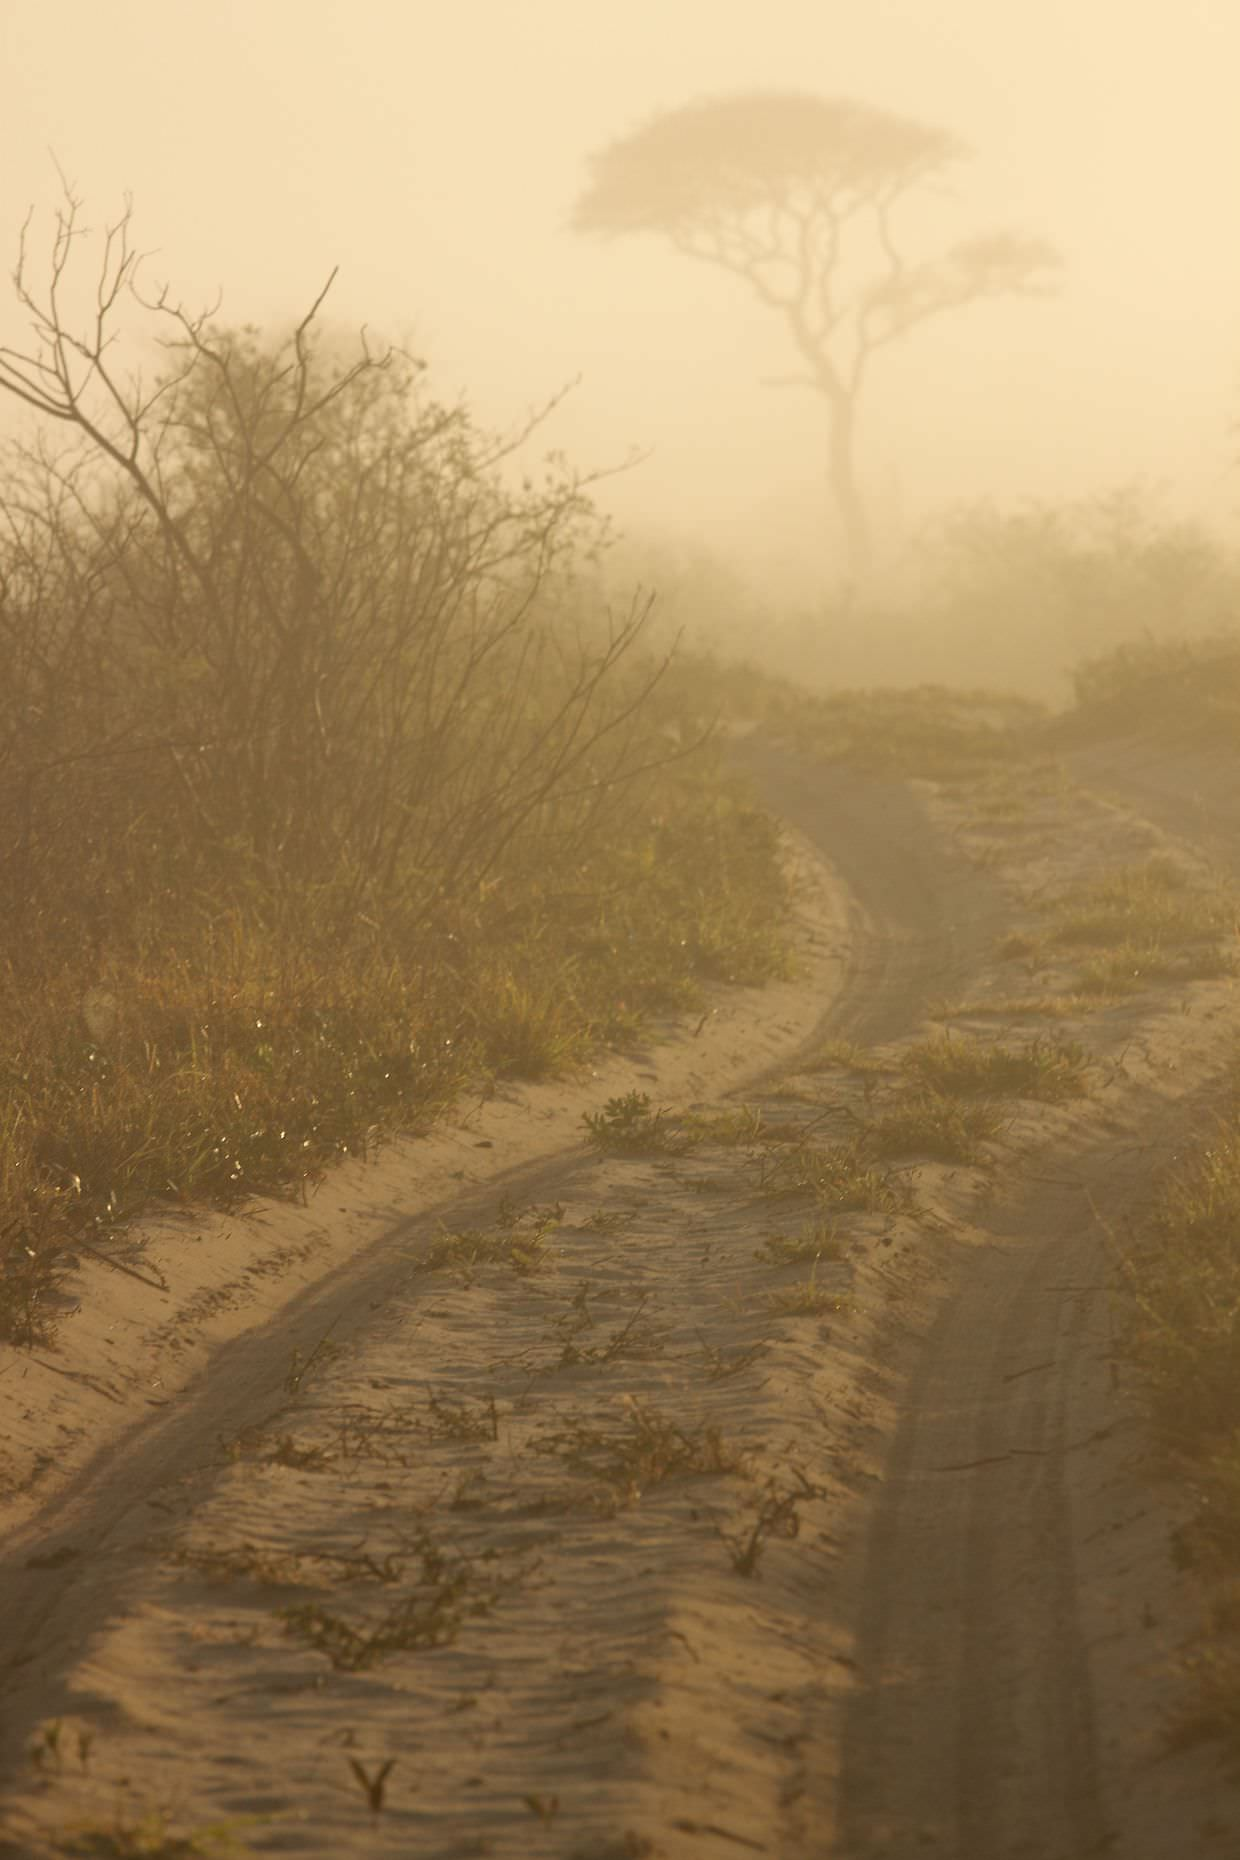 A misty morning drive